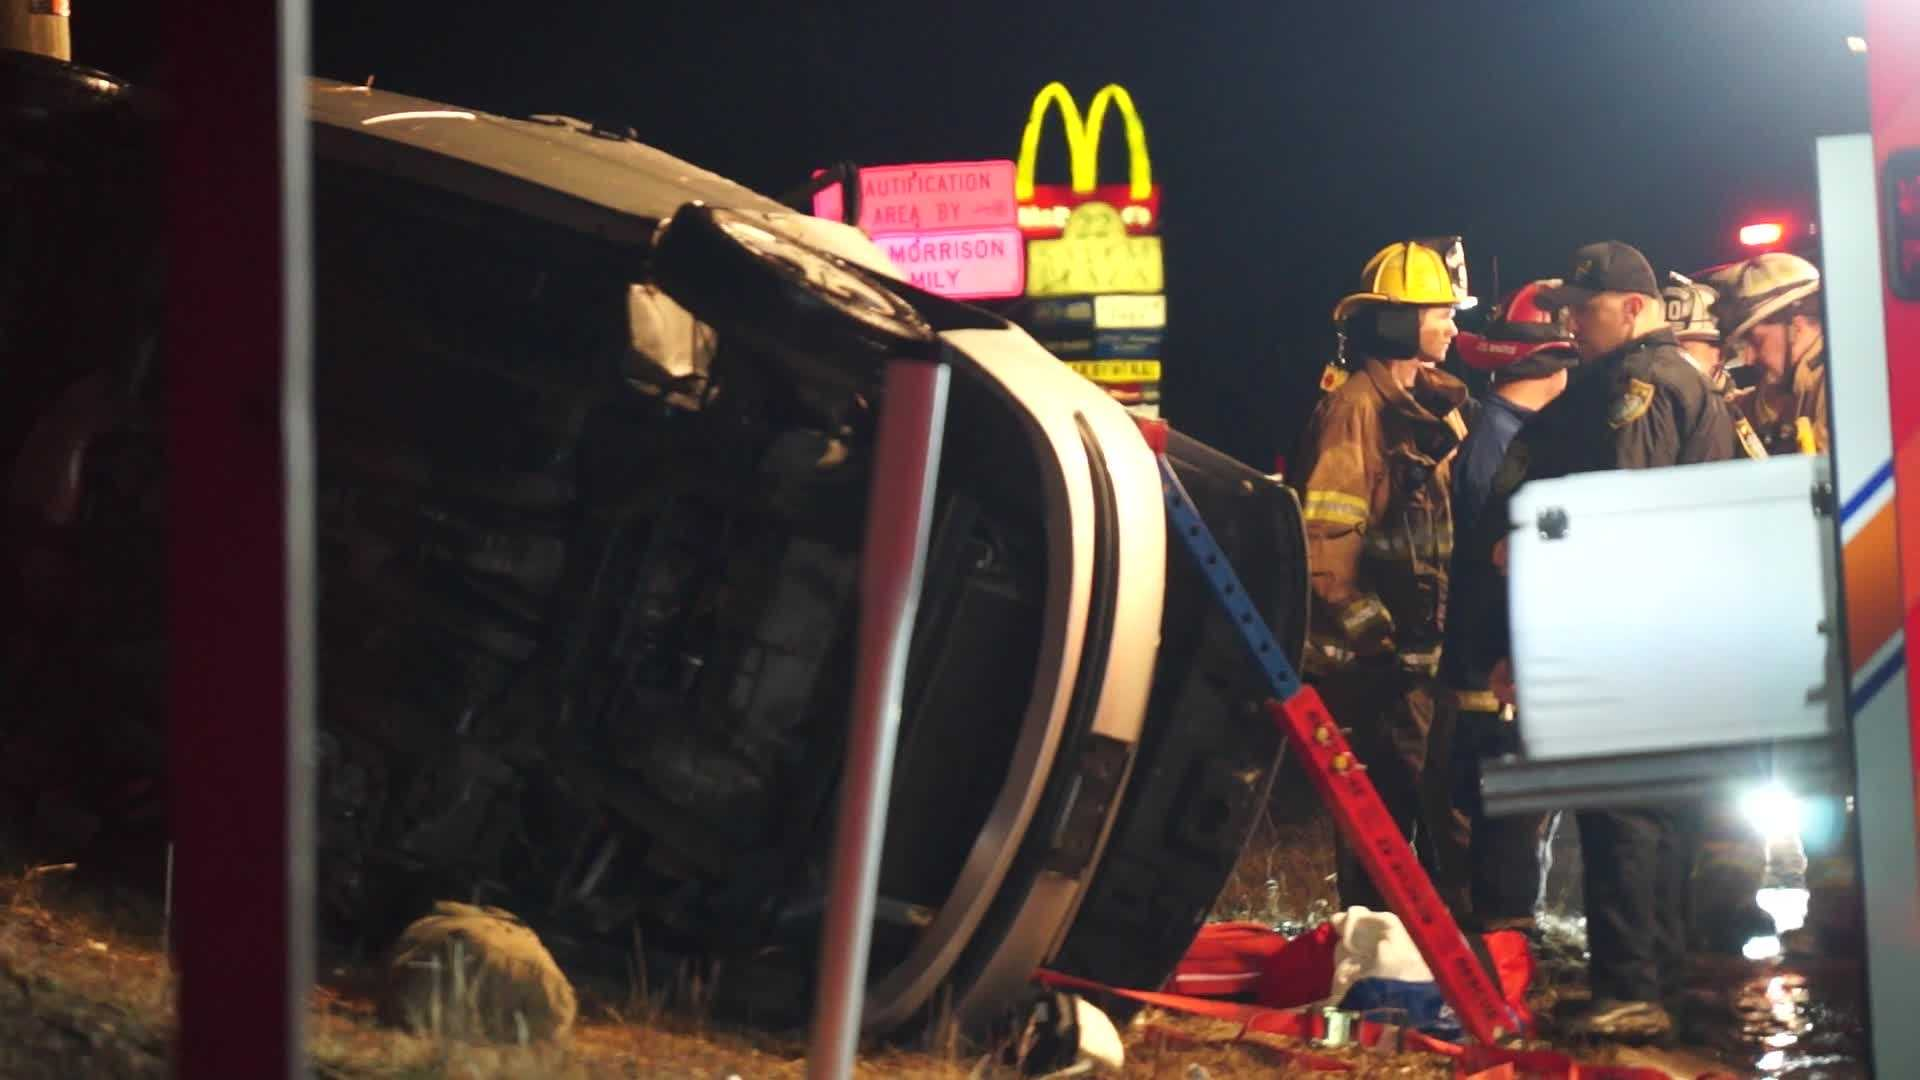 Murrysville crash (no caption)